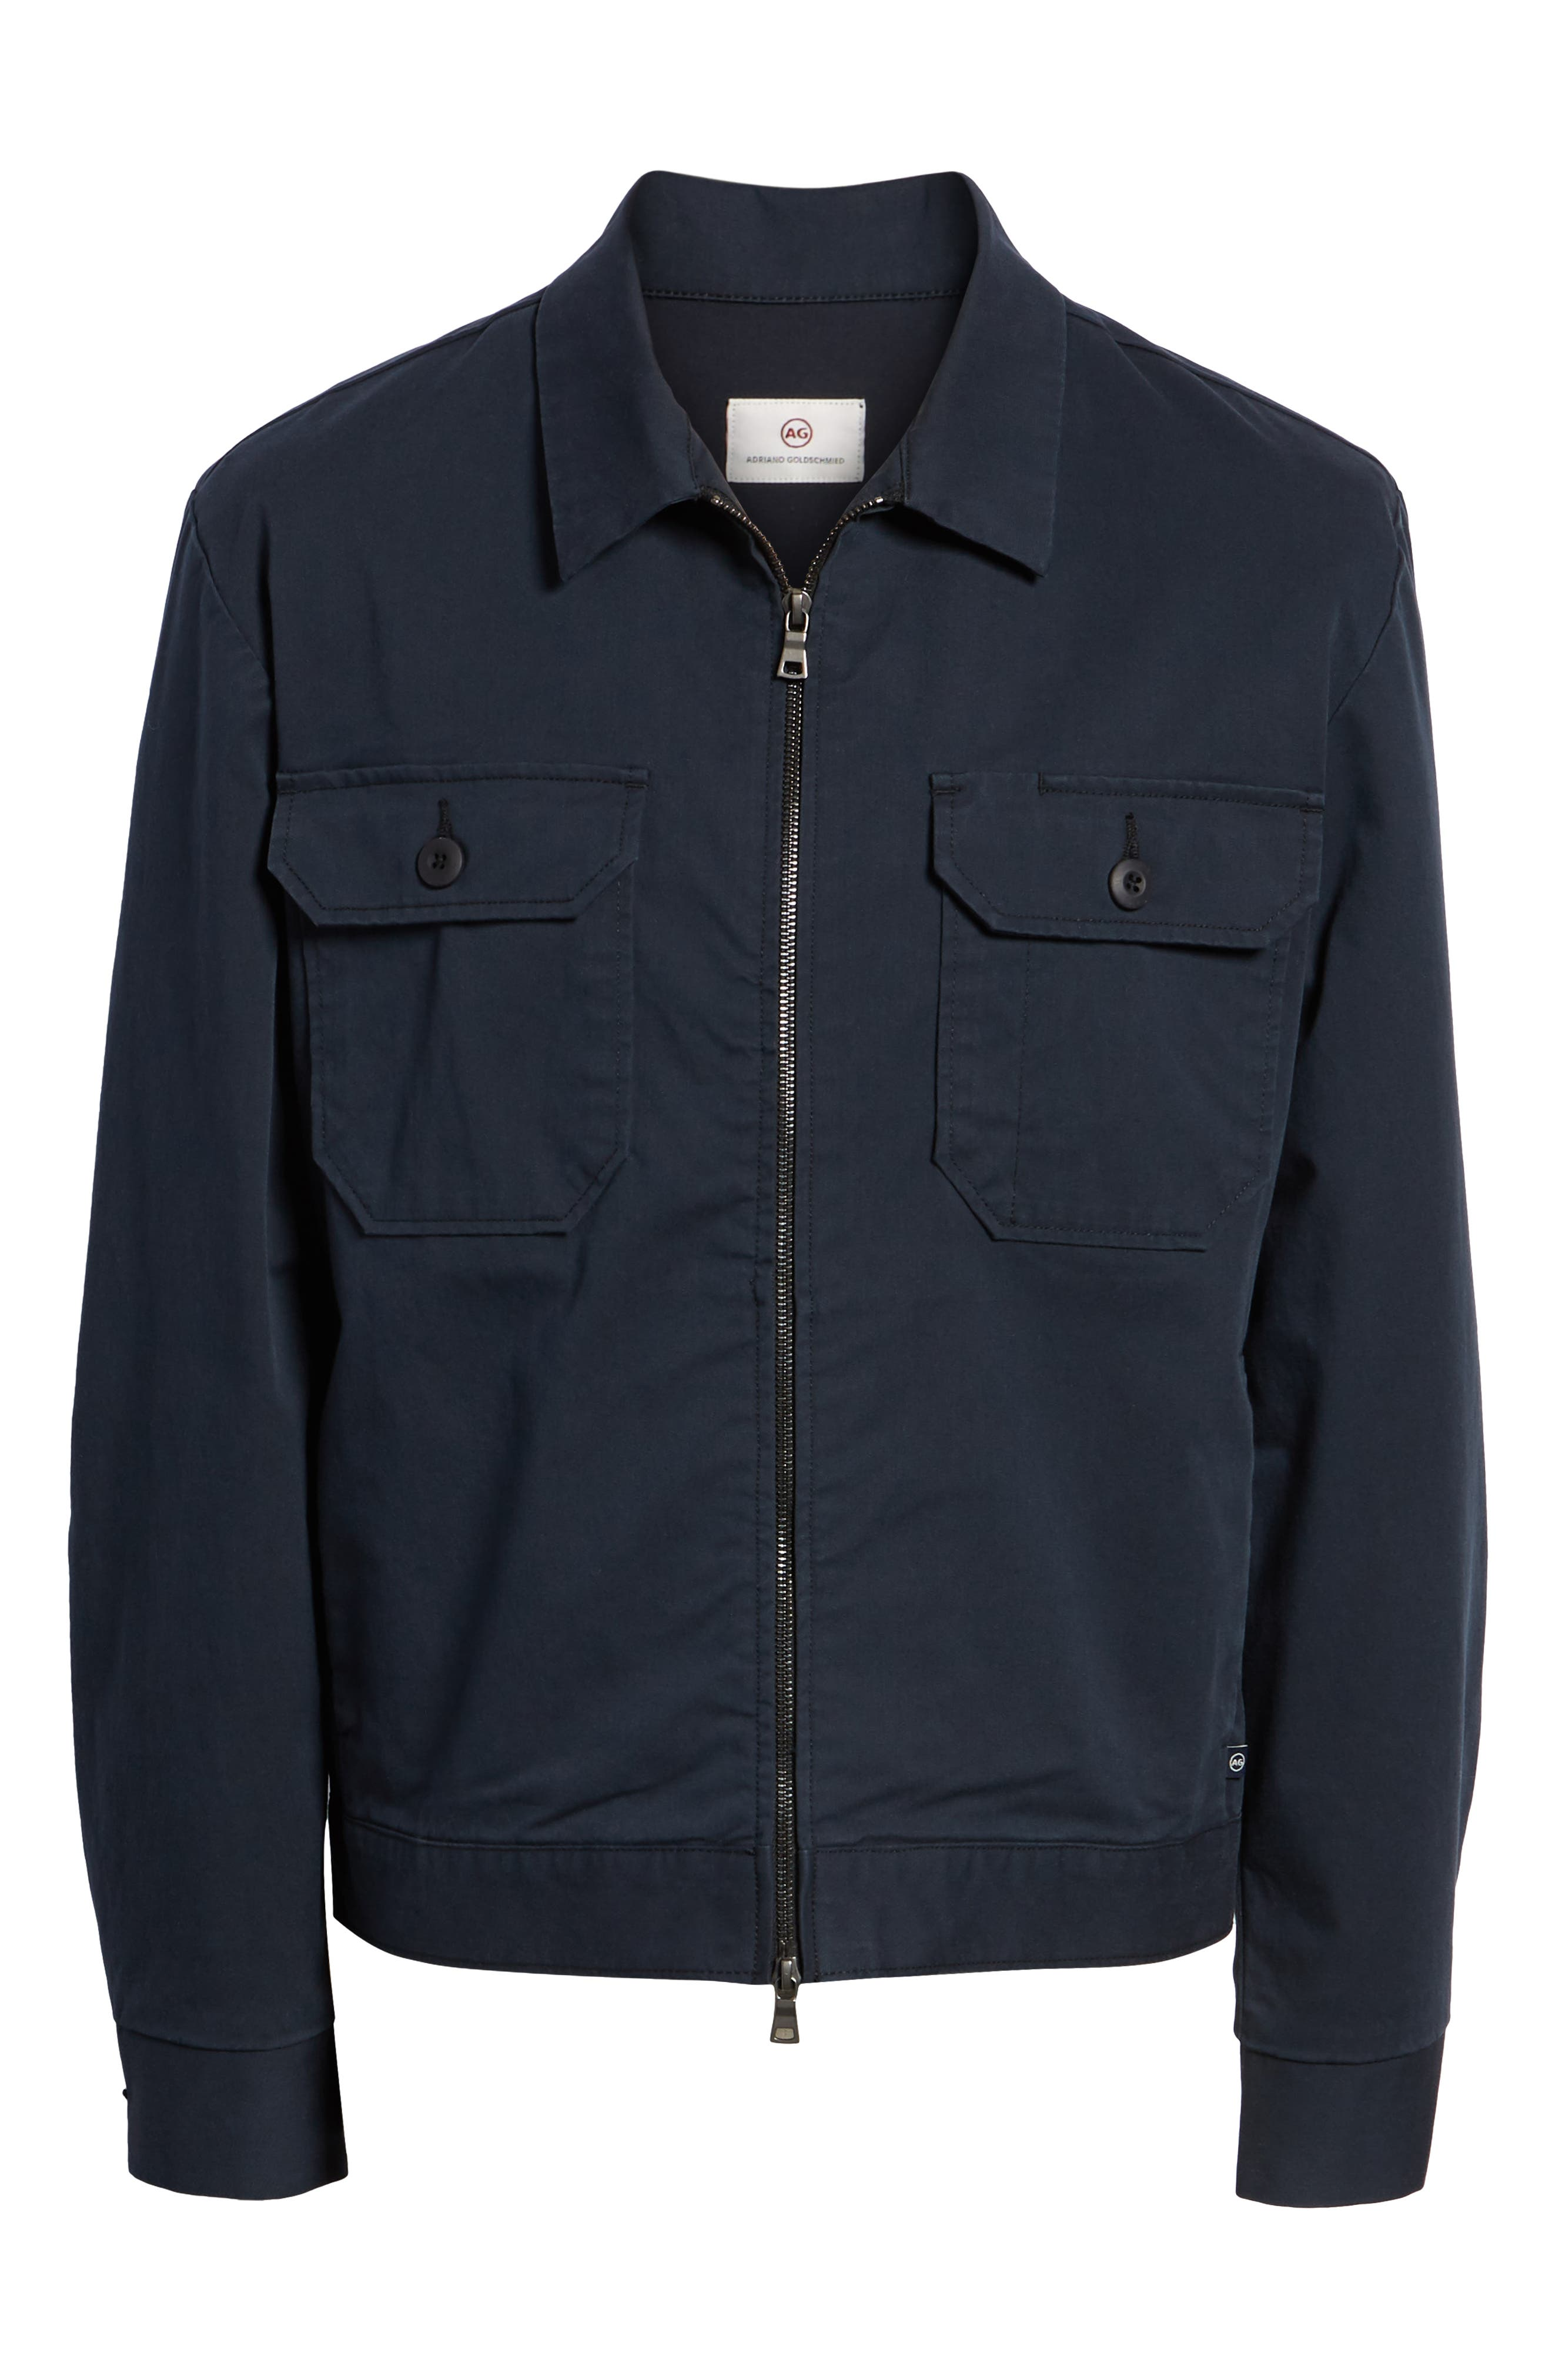 Axle Shop Regular Stretch Cotton Blend Jacket,                             Alternate thumbnail 6, color,                             BLUE VAULT/ BLACK